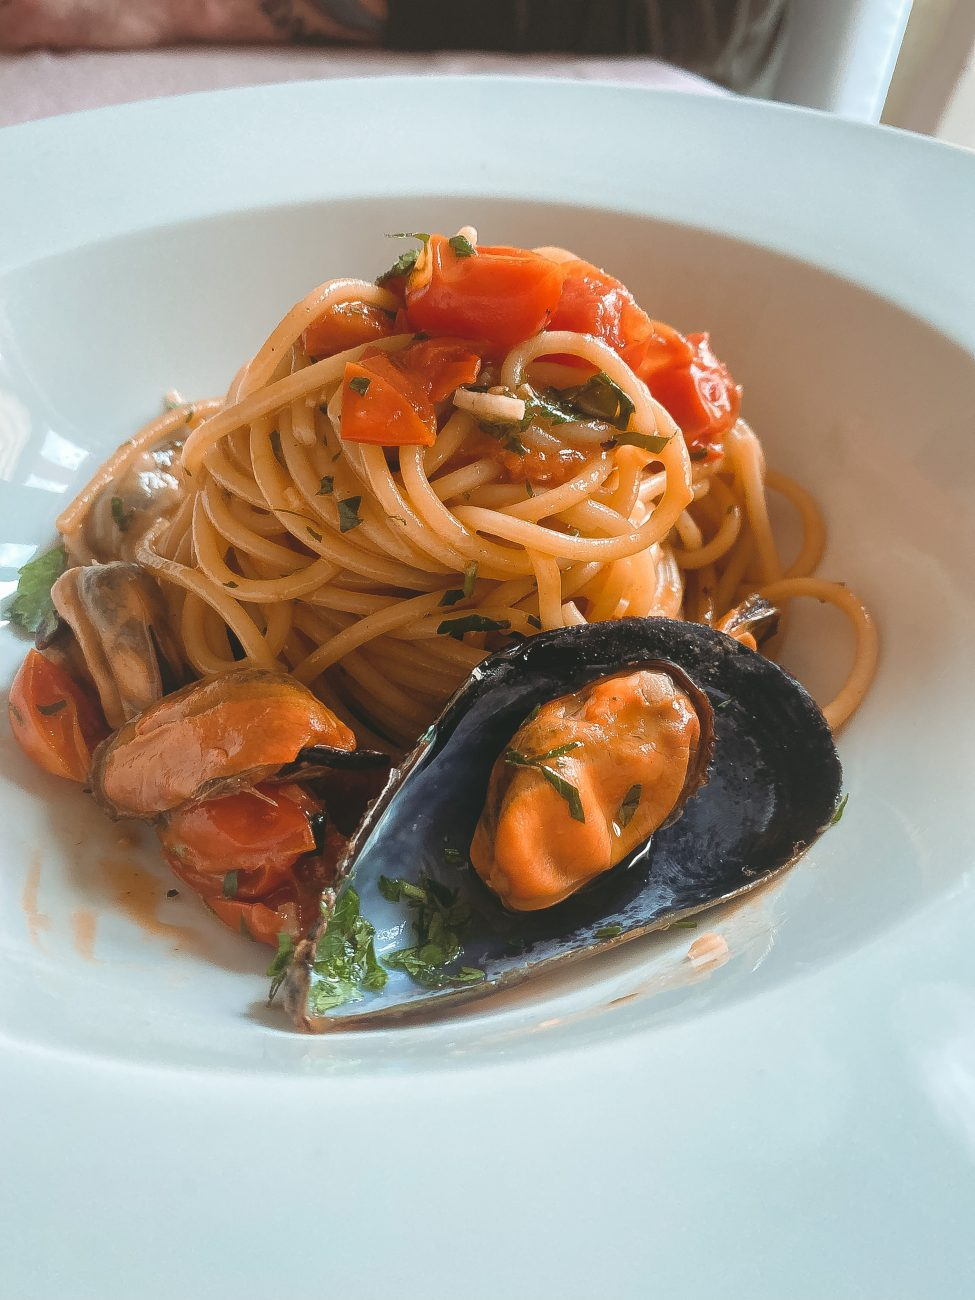 Spaghetti e cozze (mussels)